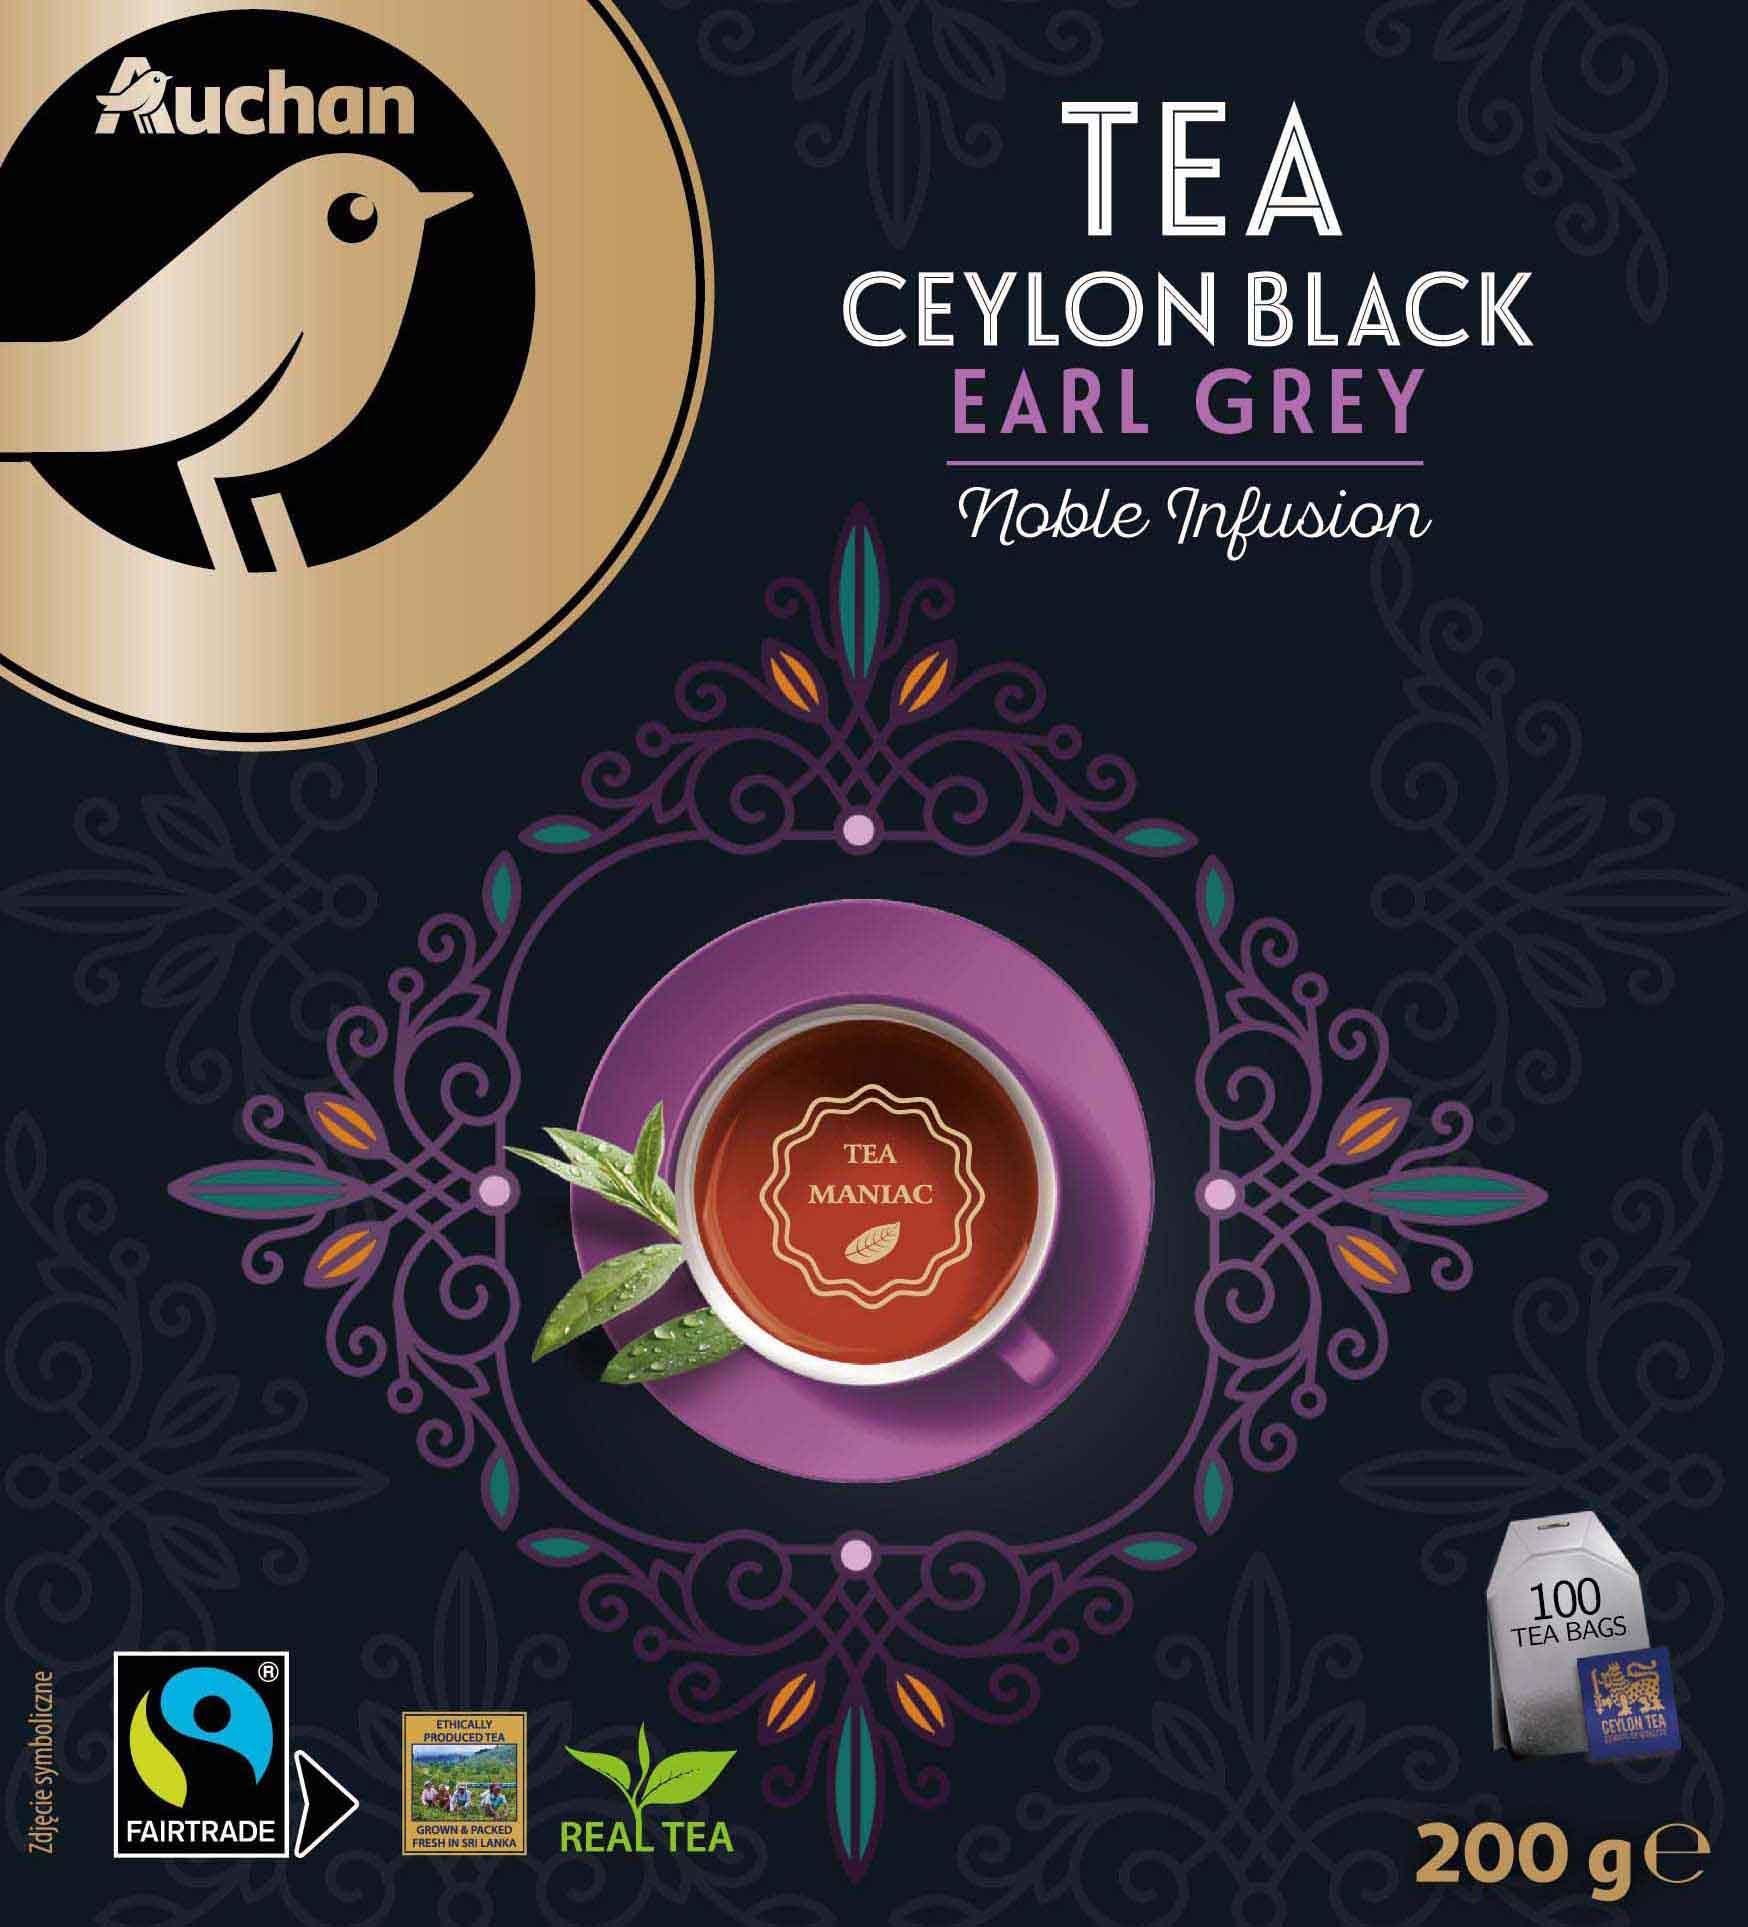 Tea Ceylon Black Earl Grey